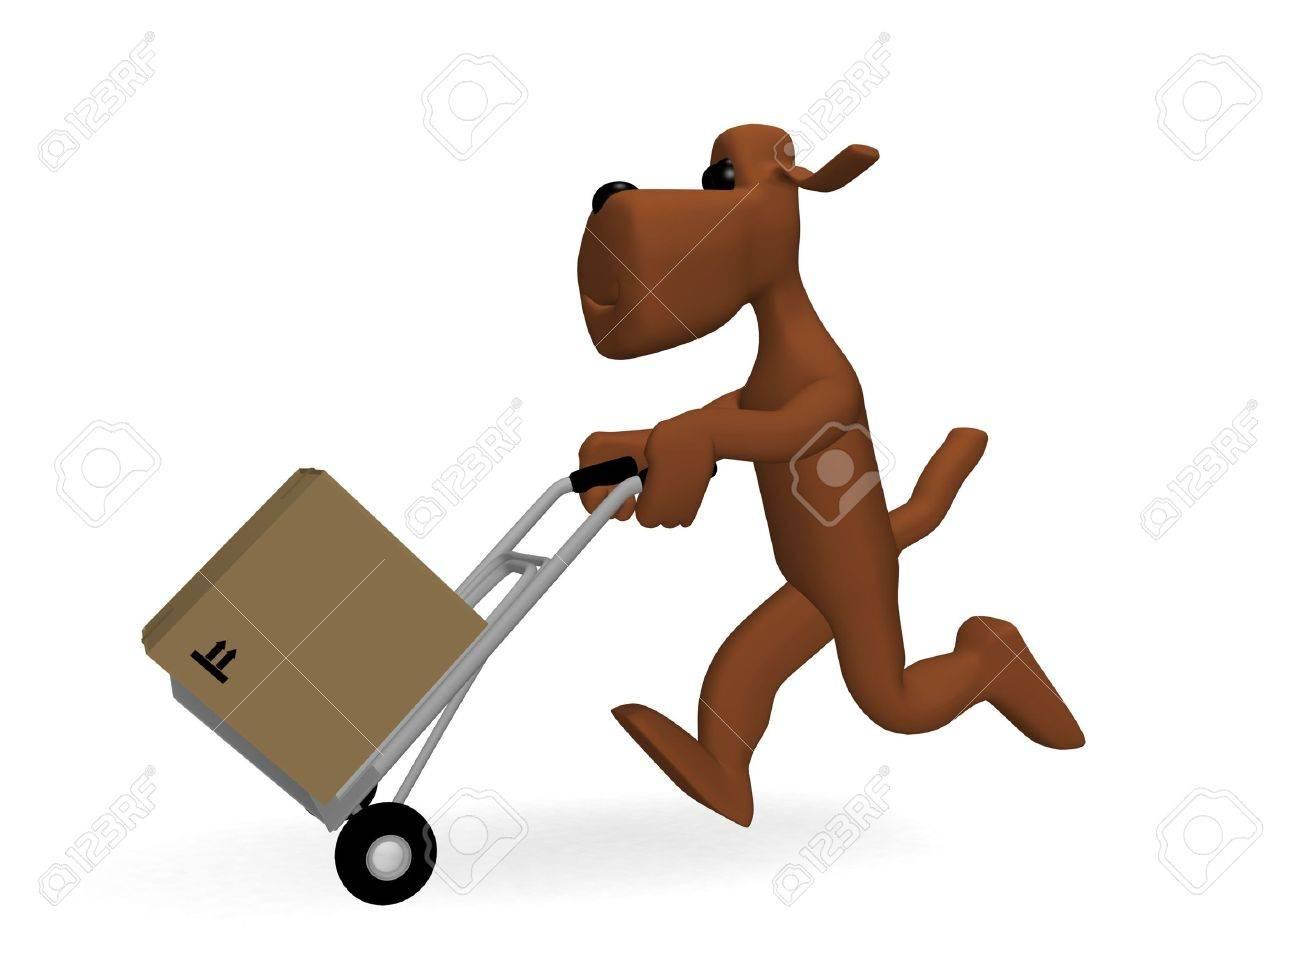 dog parcels Stock Photo - 6567796